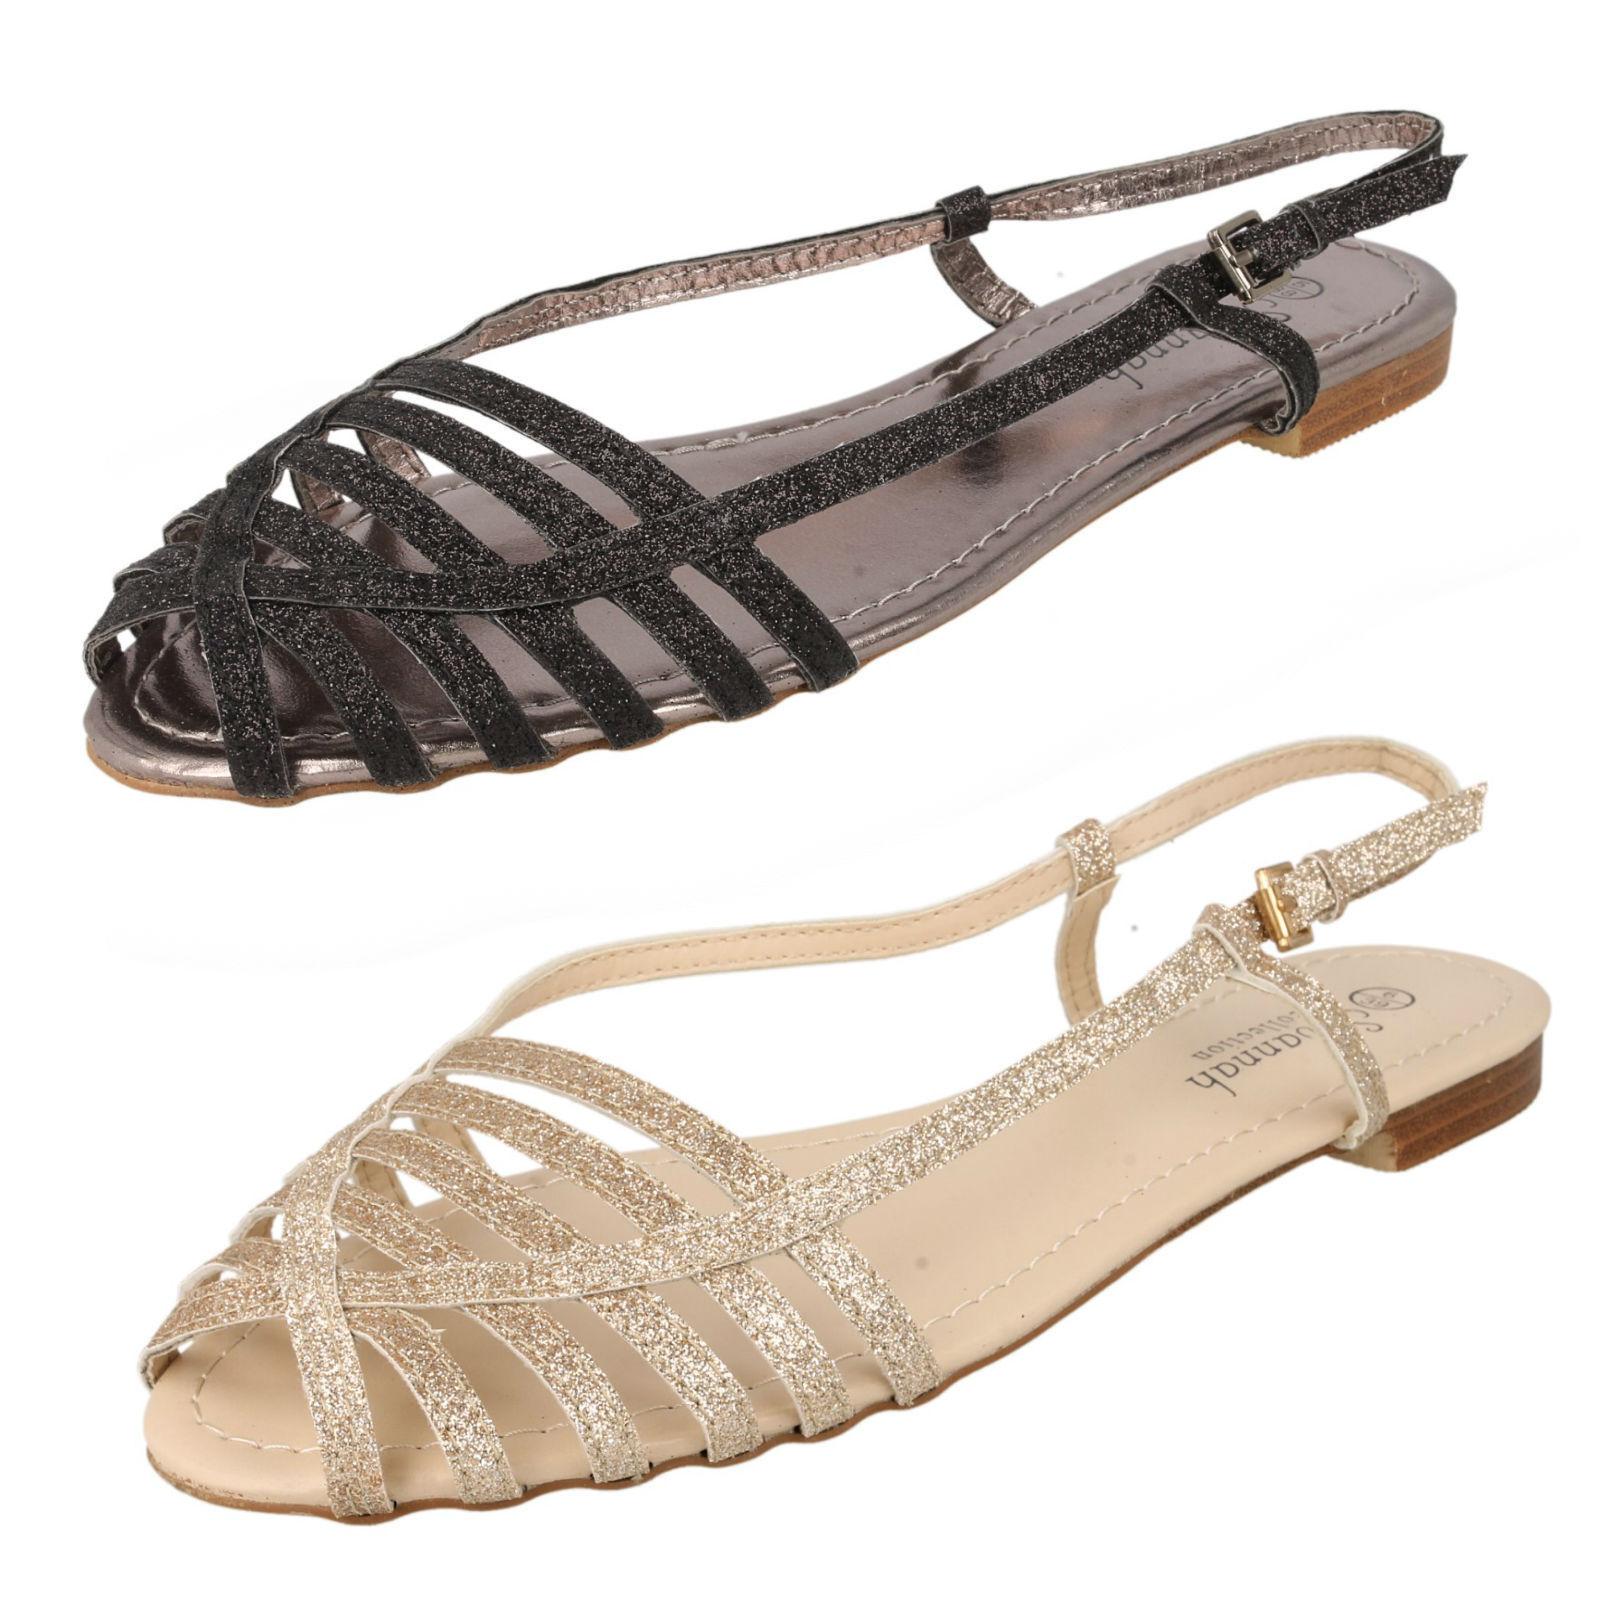 SALE NOW Ladies Savannah Glitter F0881 ankle buckle strap sandal F0881 Glitter e9ad1b